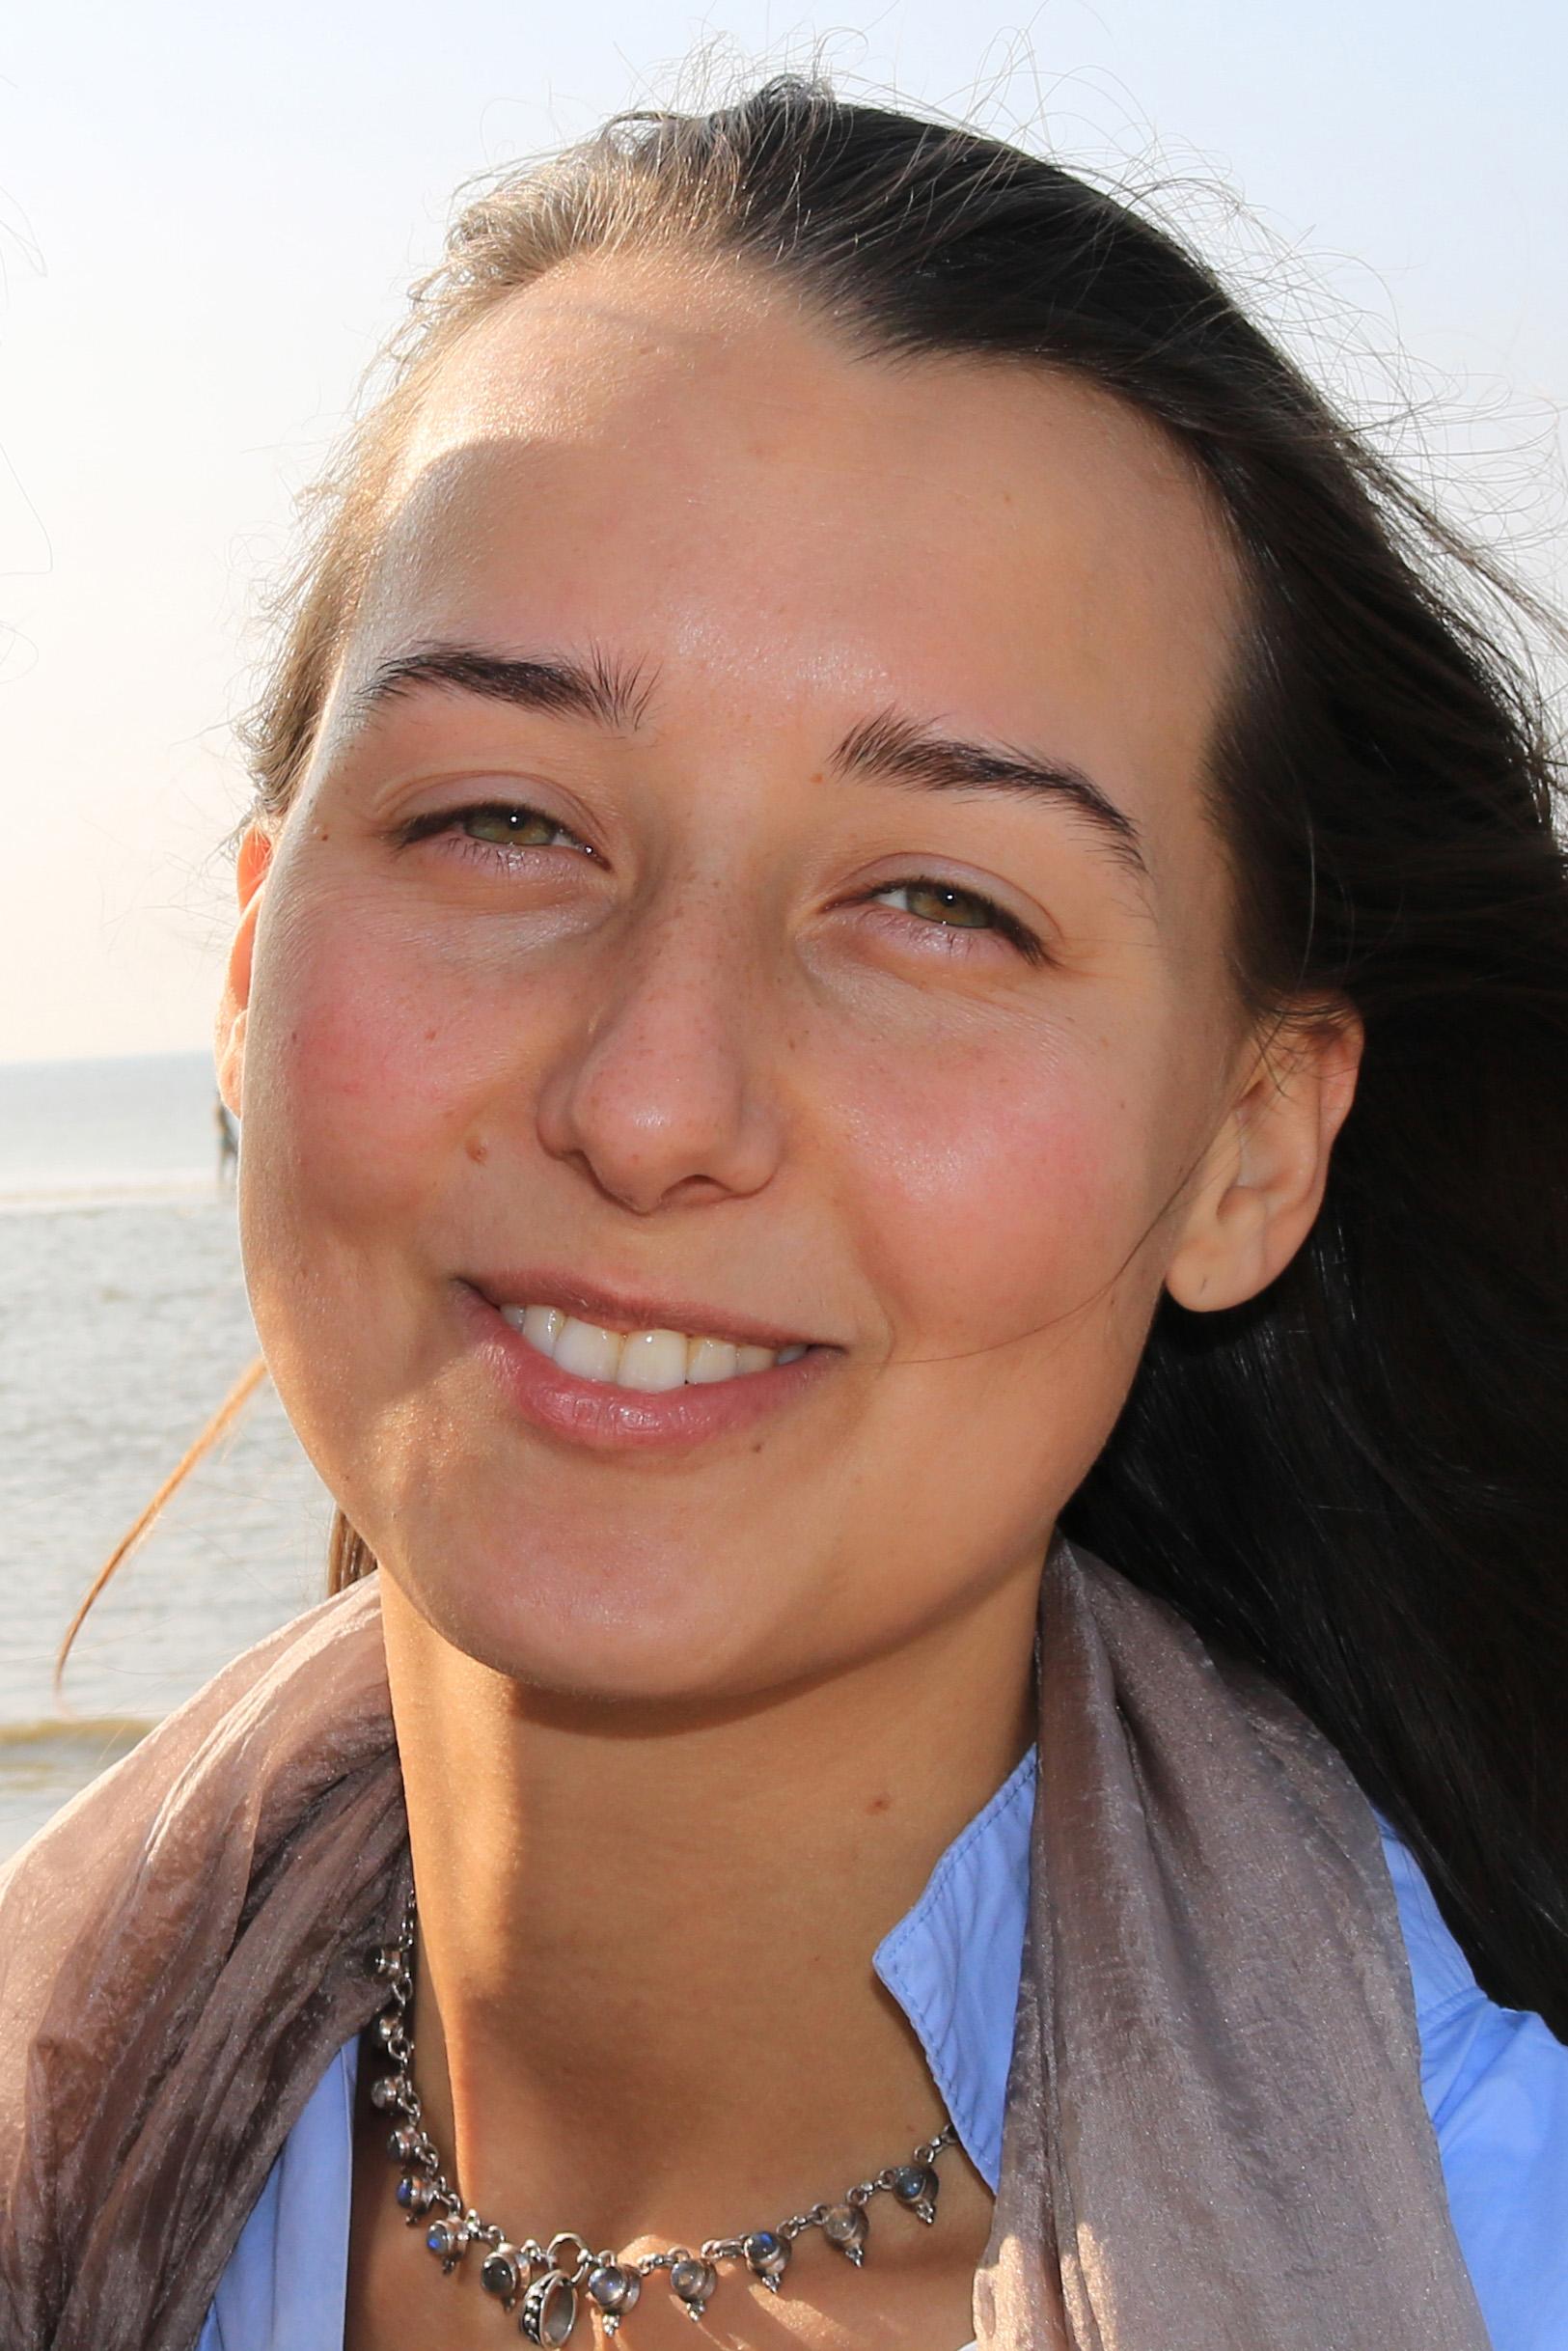 LauraKlinkenberg